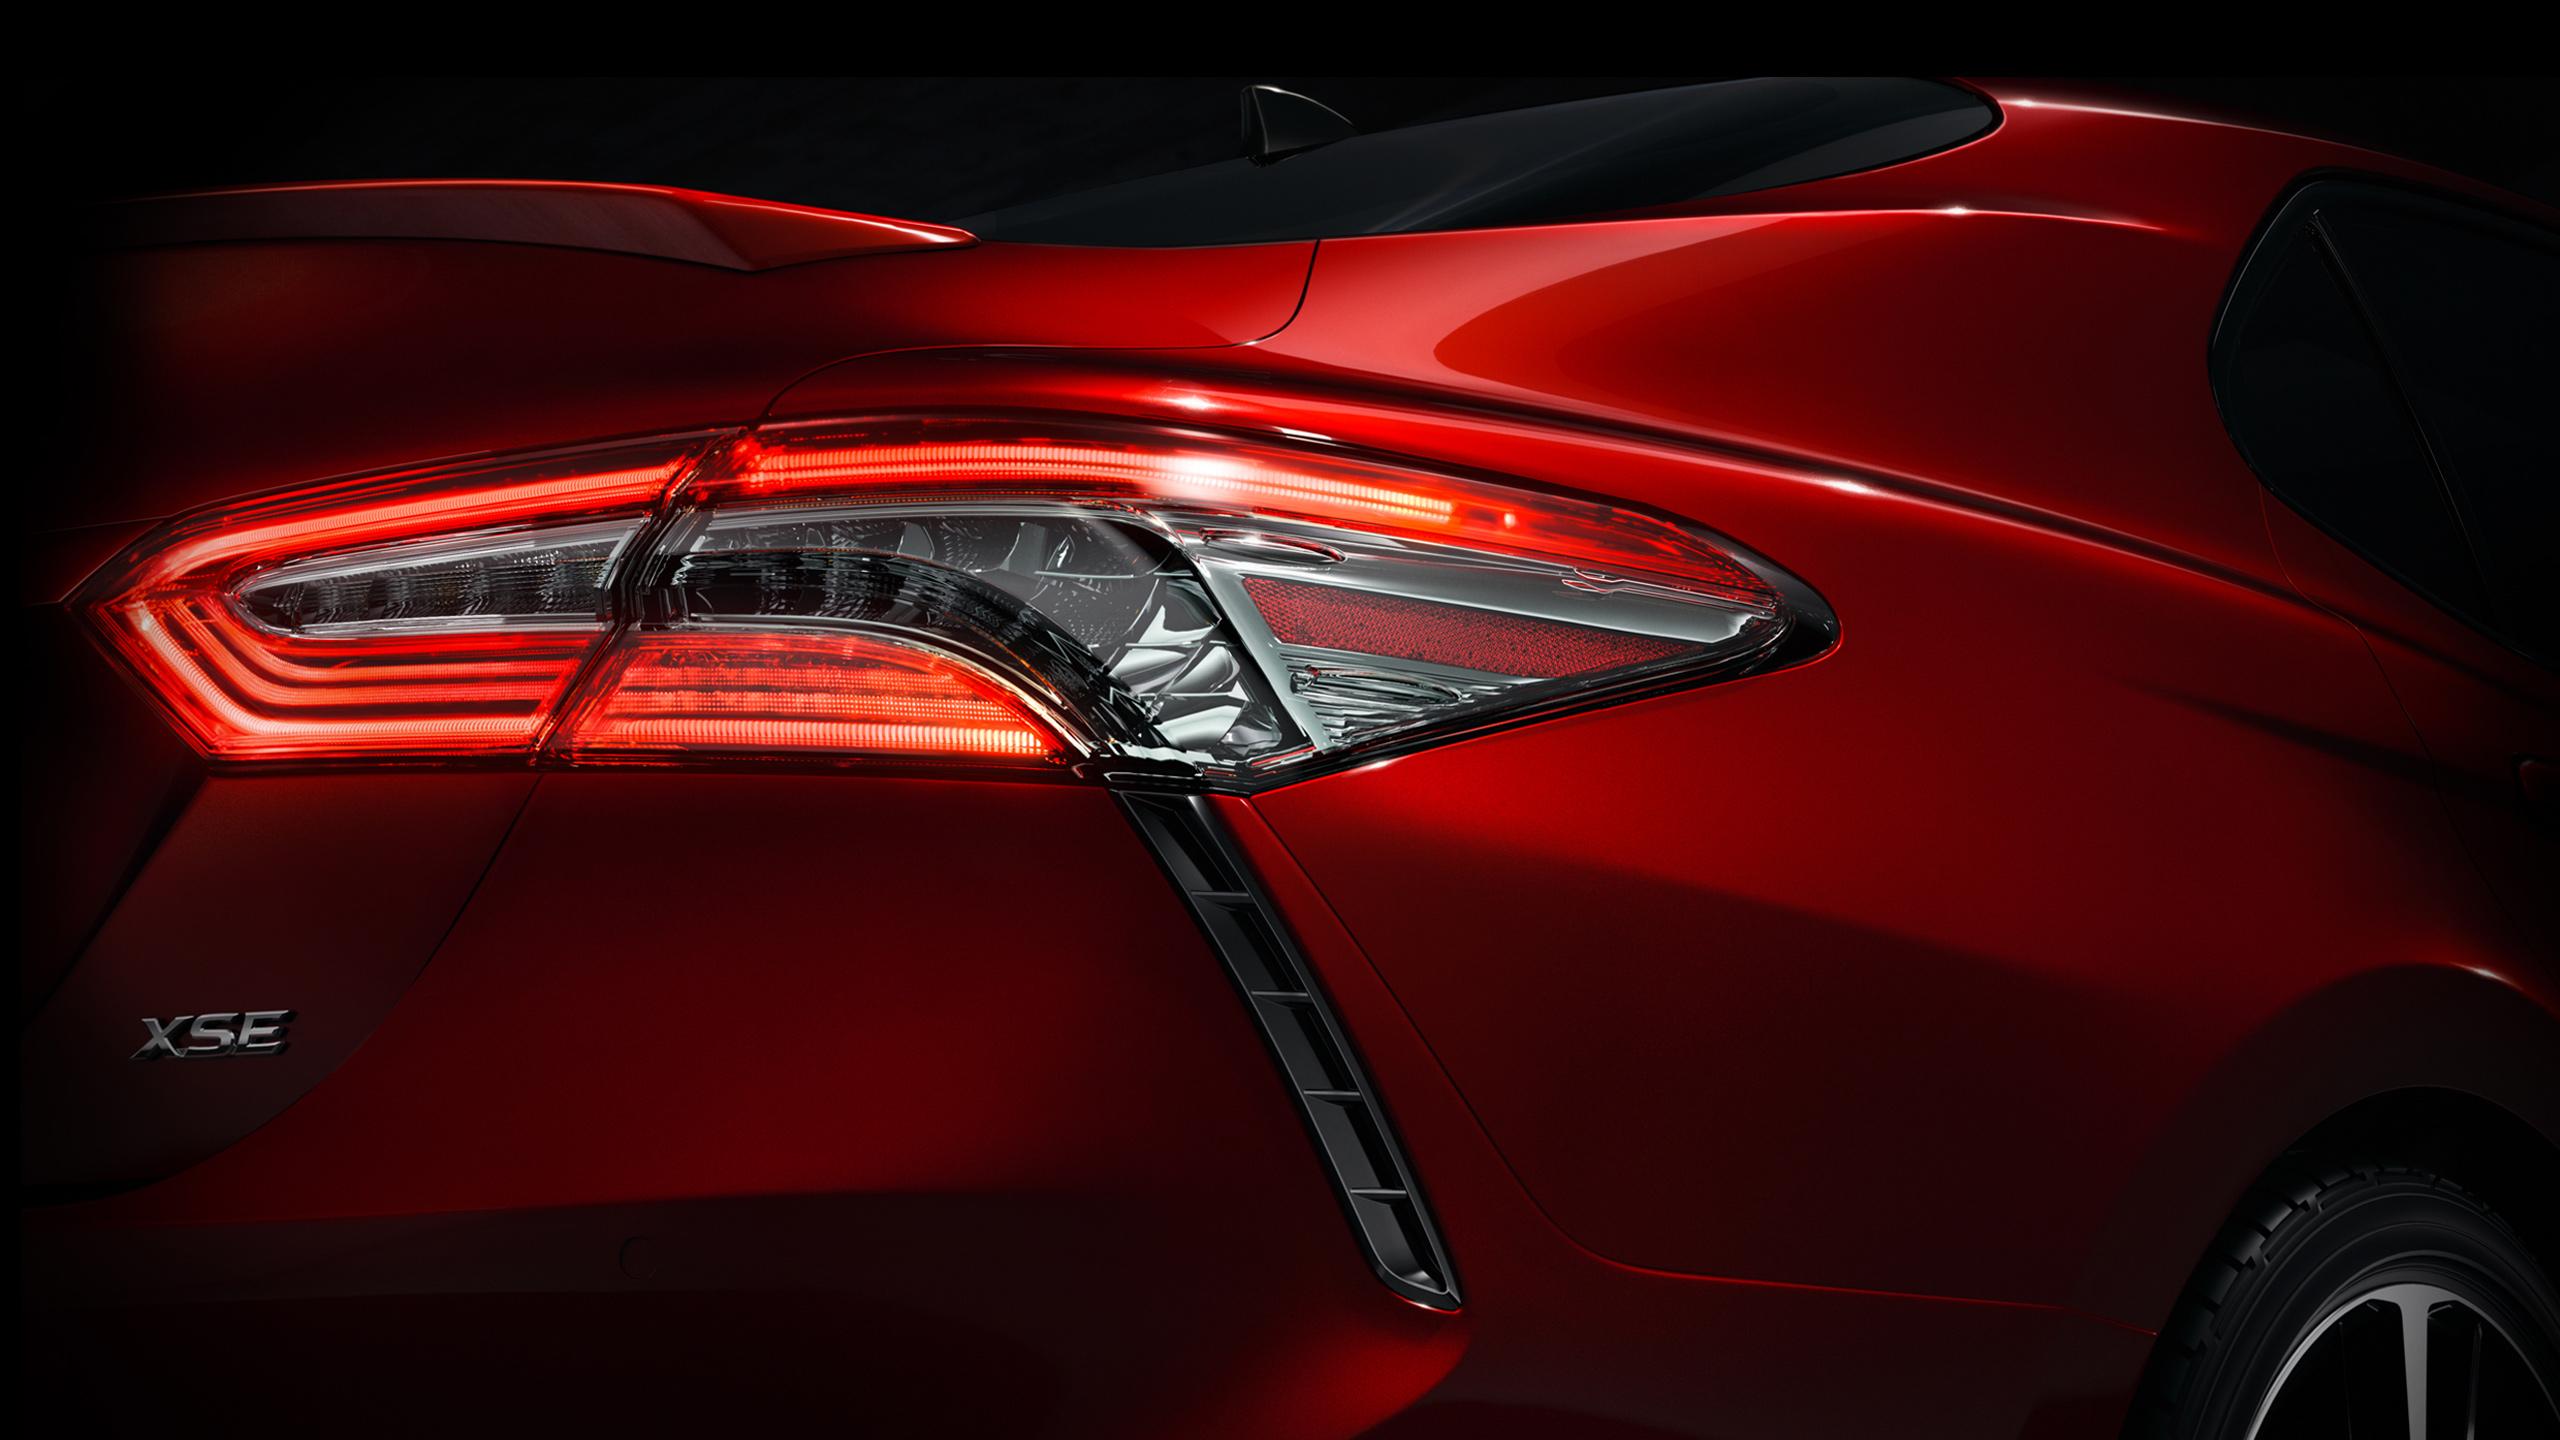 Toyota Camry Wallpaper 6   2560 X 1440 stmednet 2560x1440